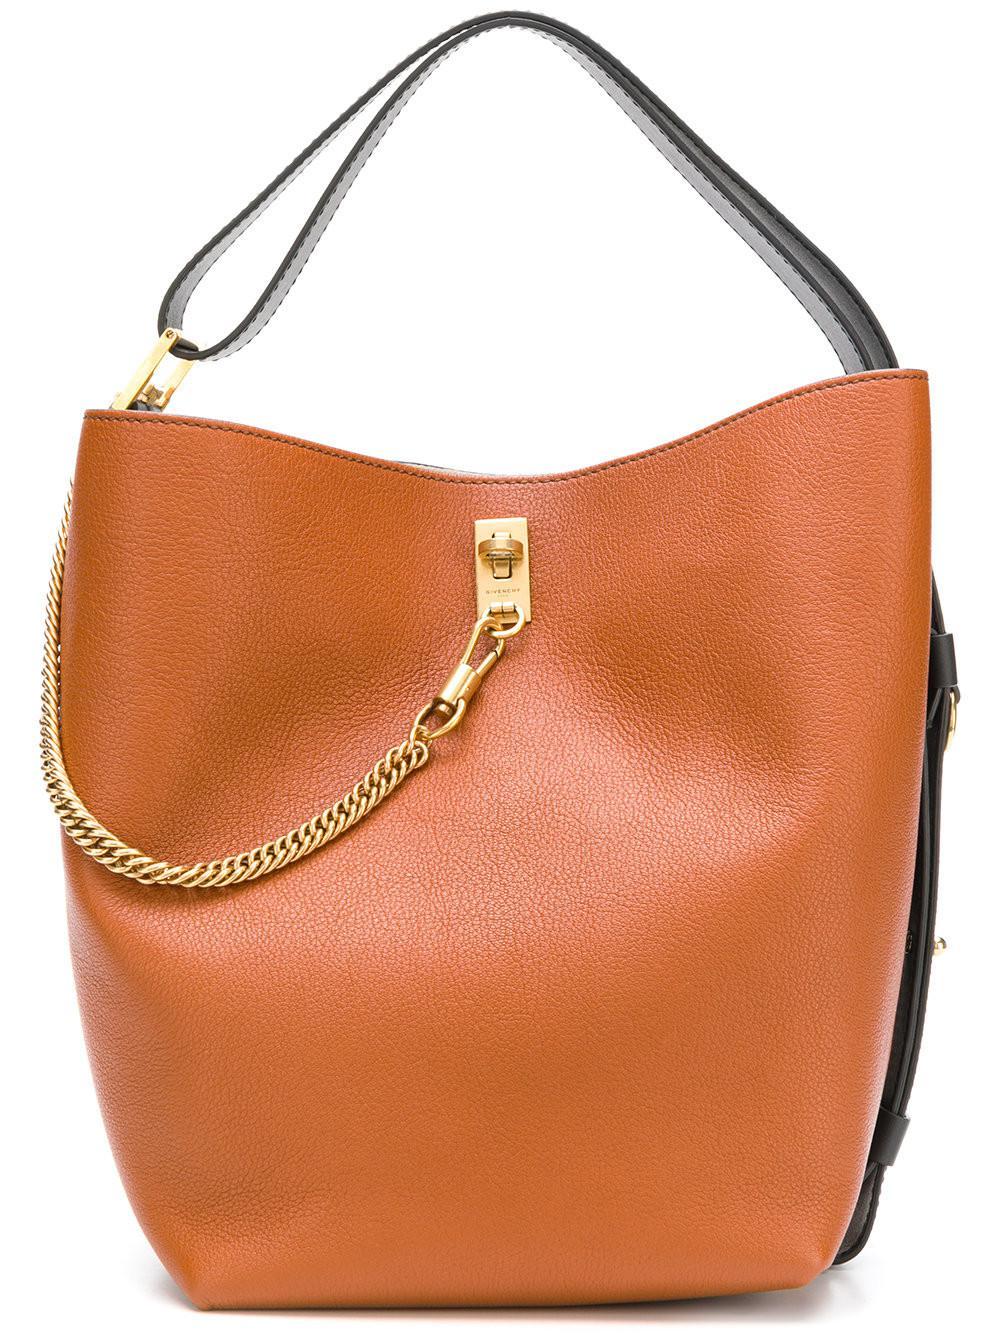 b9db7573f892 Givenchy Gv Bucket Bag in Brown - Lyst